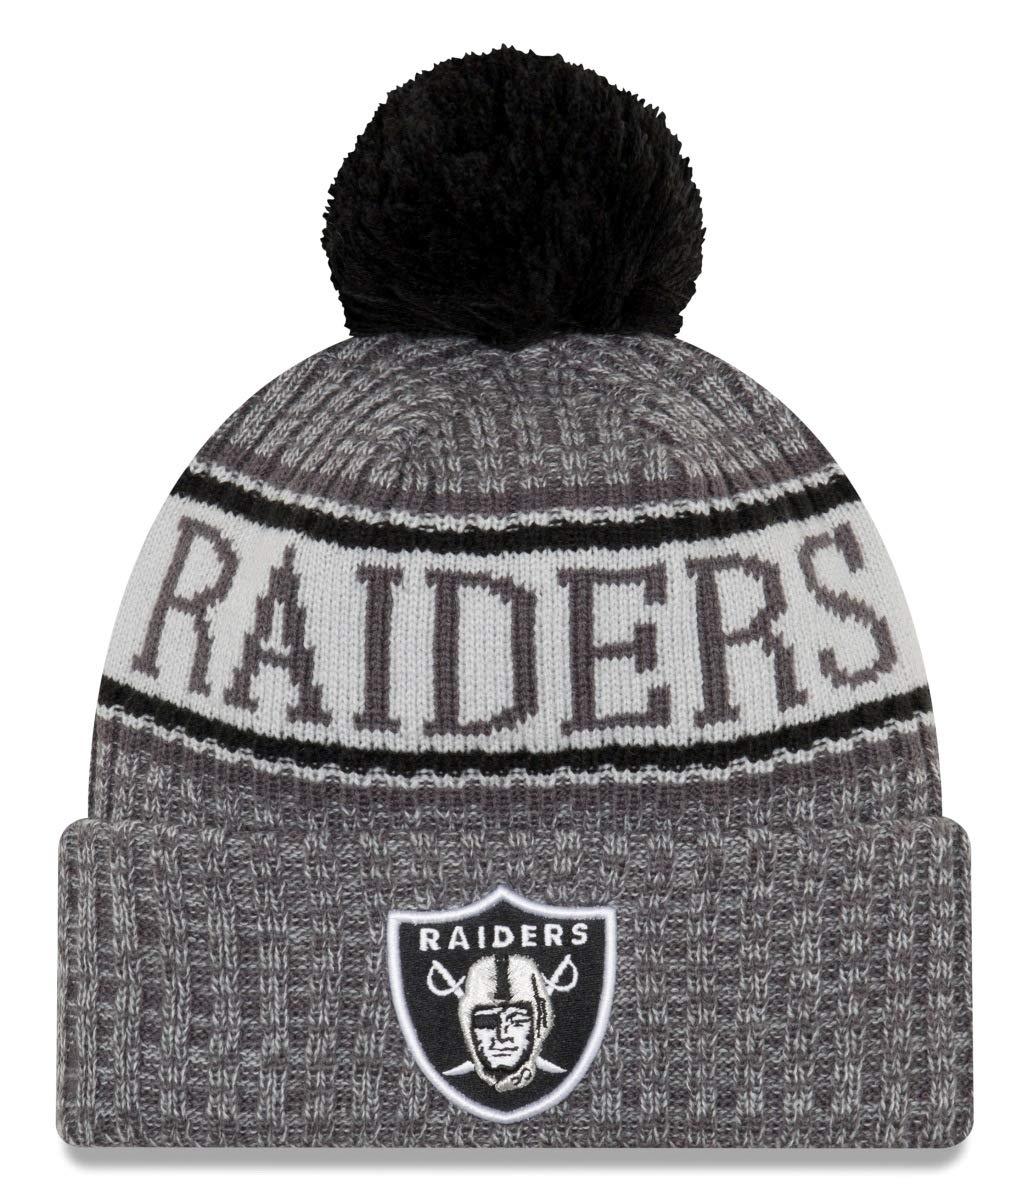 5a05da730b5 New Era Official Oakland Raiders Grey Bobble Hat Beanie With Pom NFL Badge  Crest